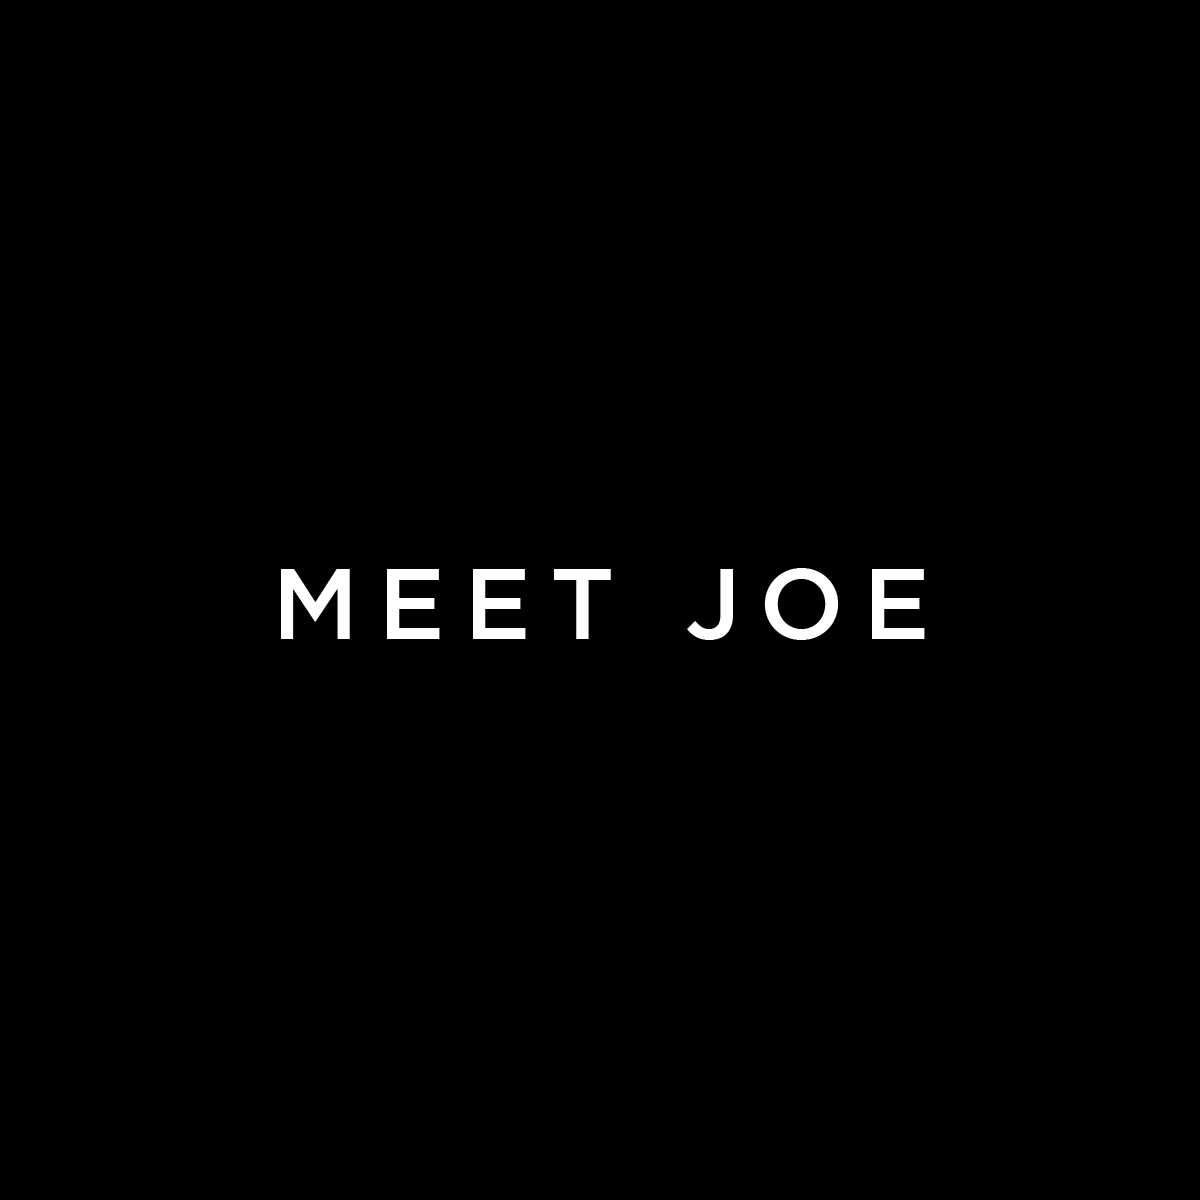 meet-joe